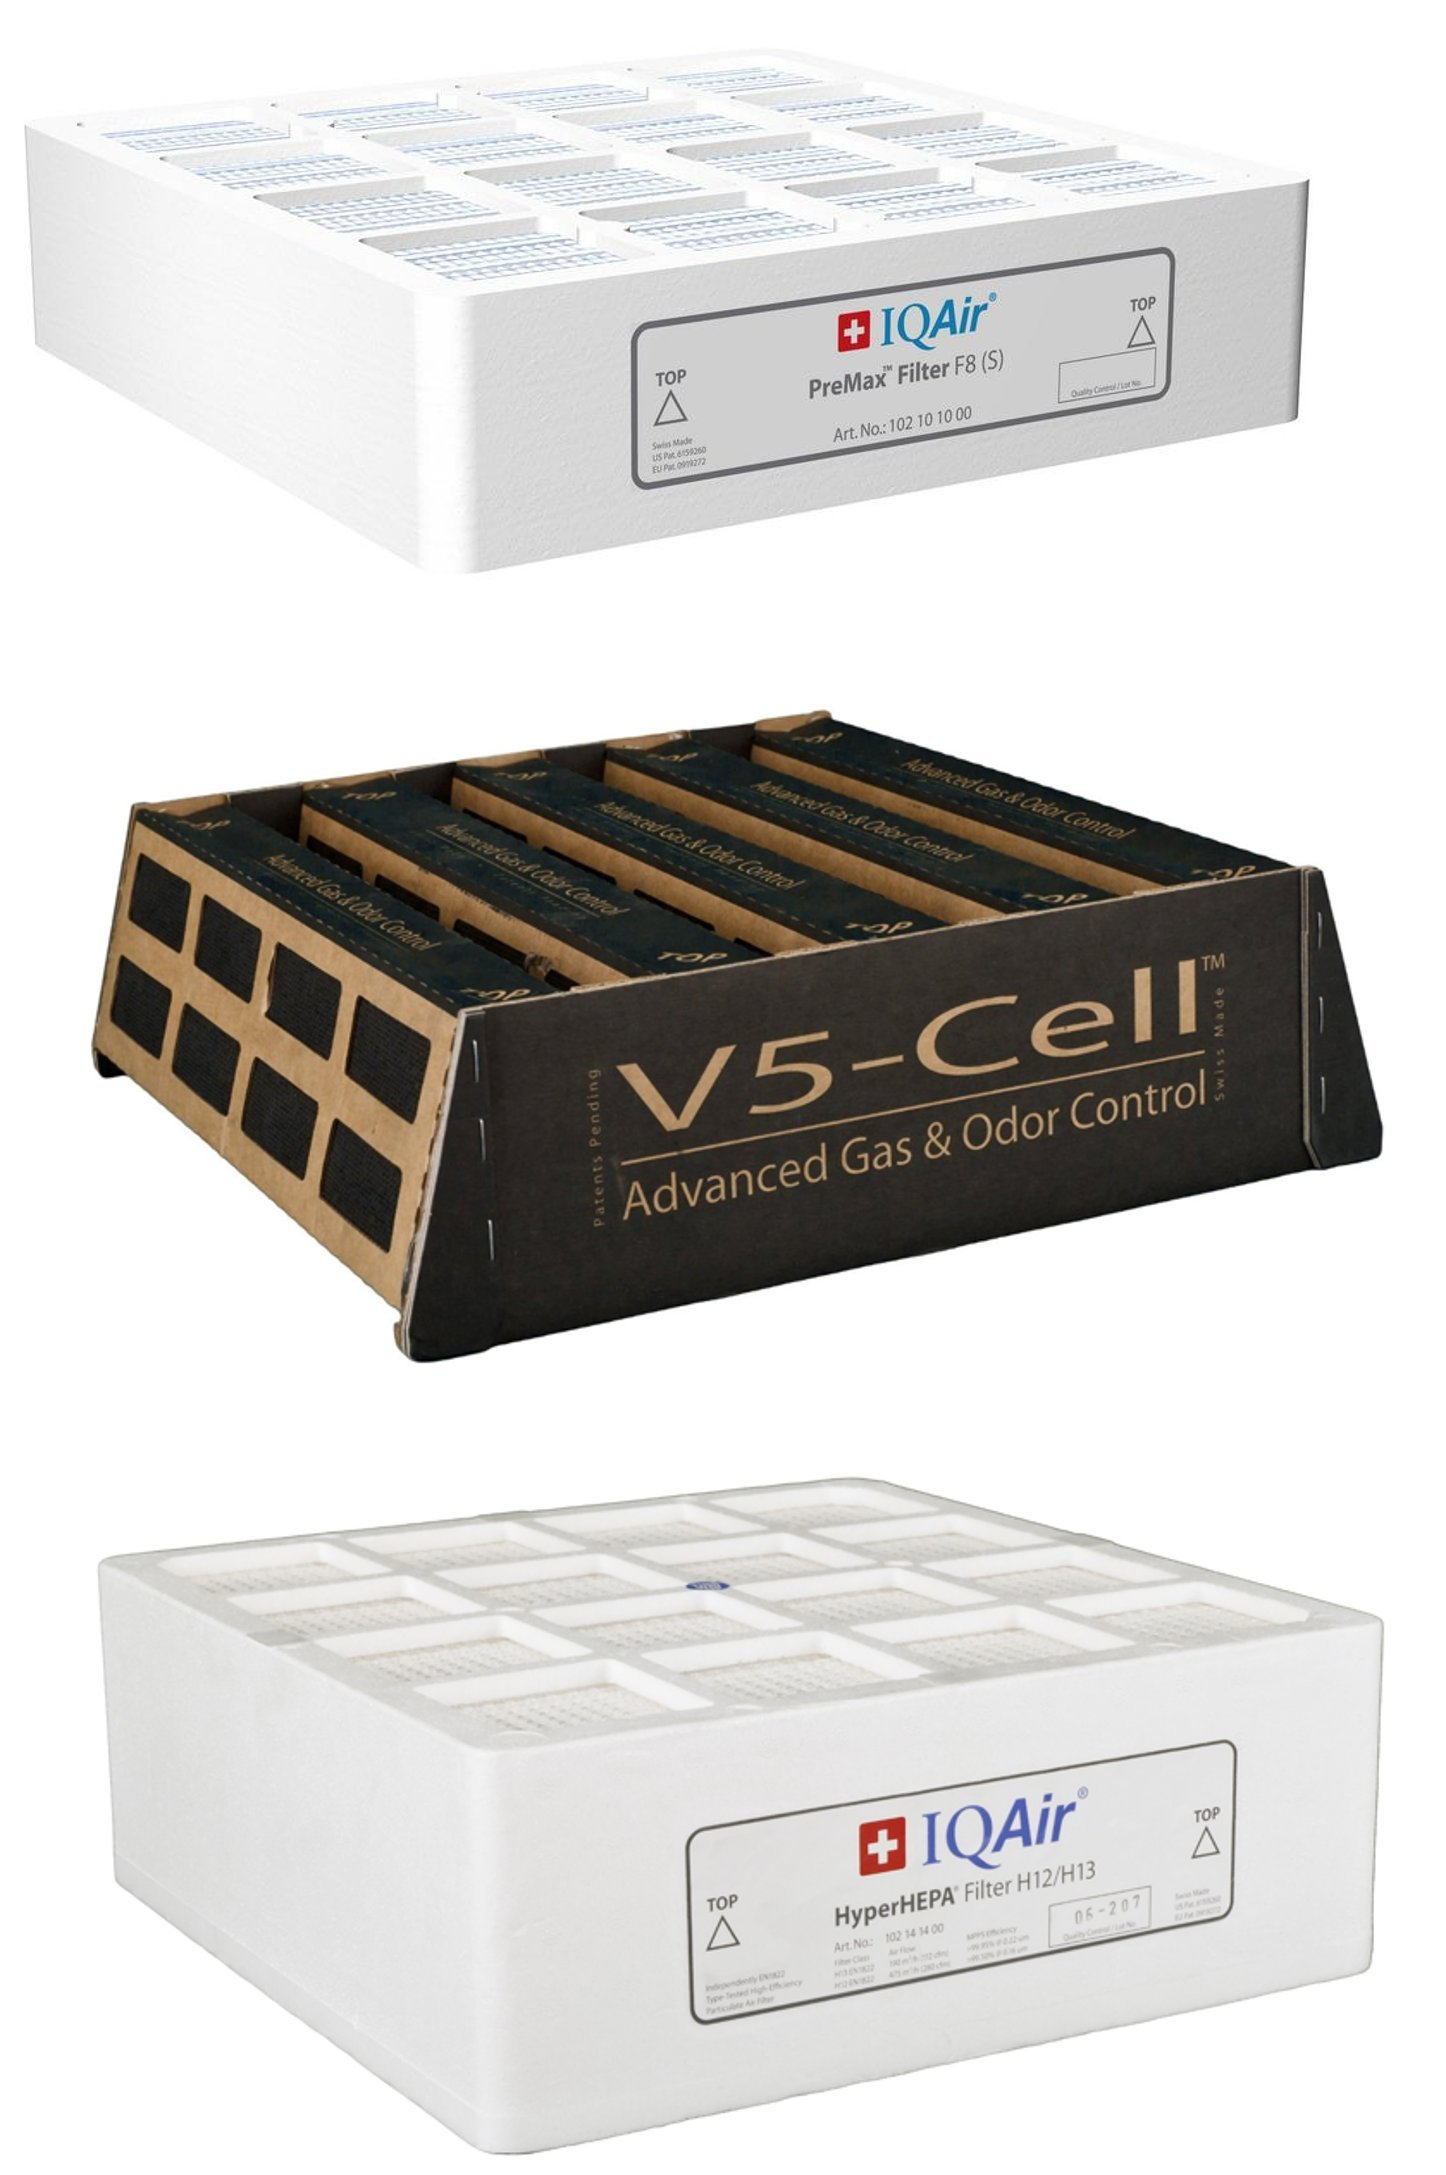 IQAir HealthPro Plus 3 Filter Bundle (PreMax, V5-Cell, HyperHEPA)